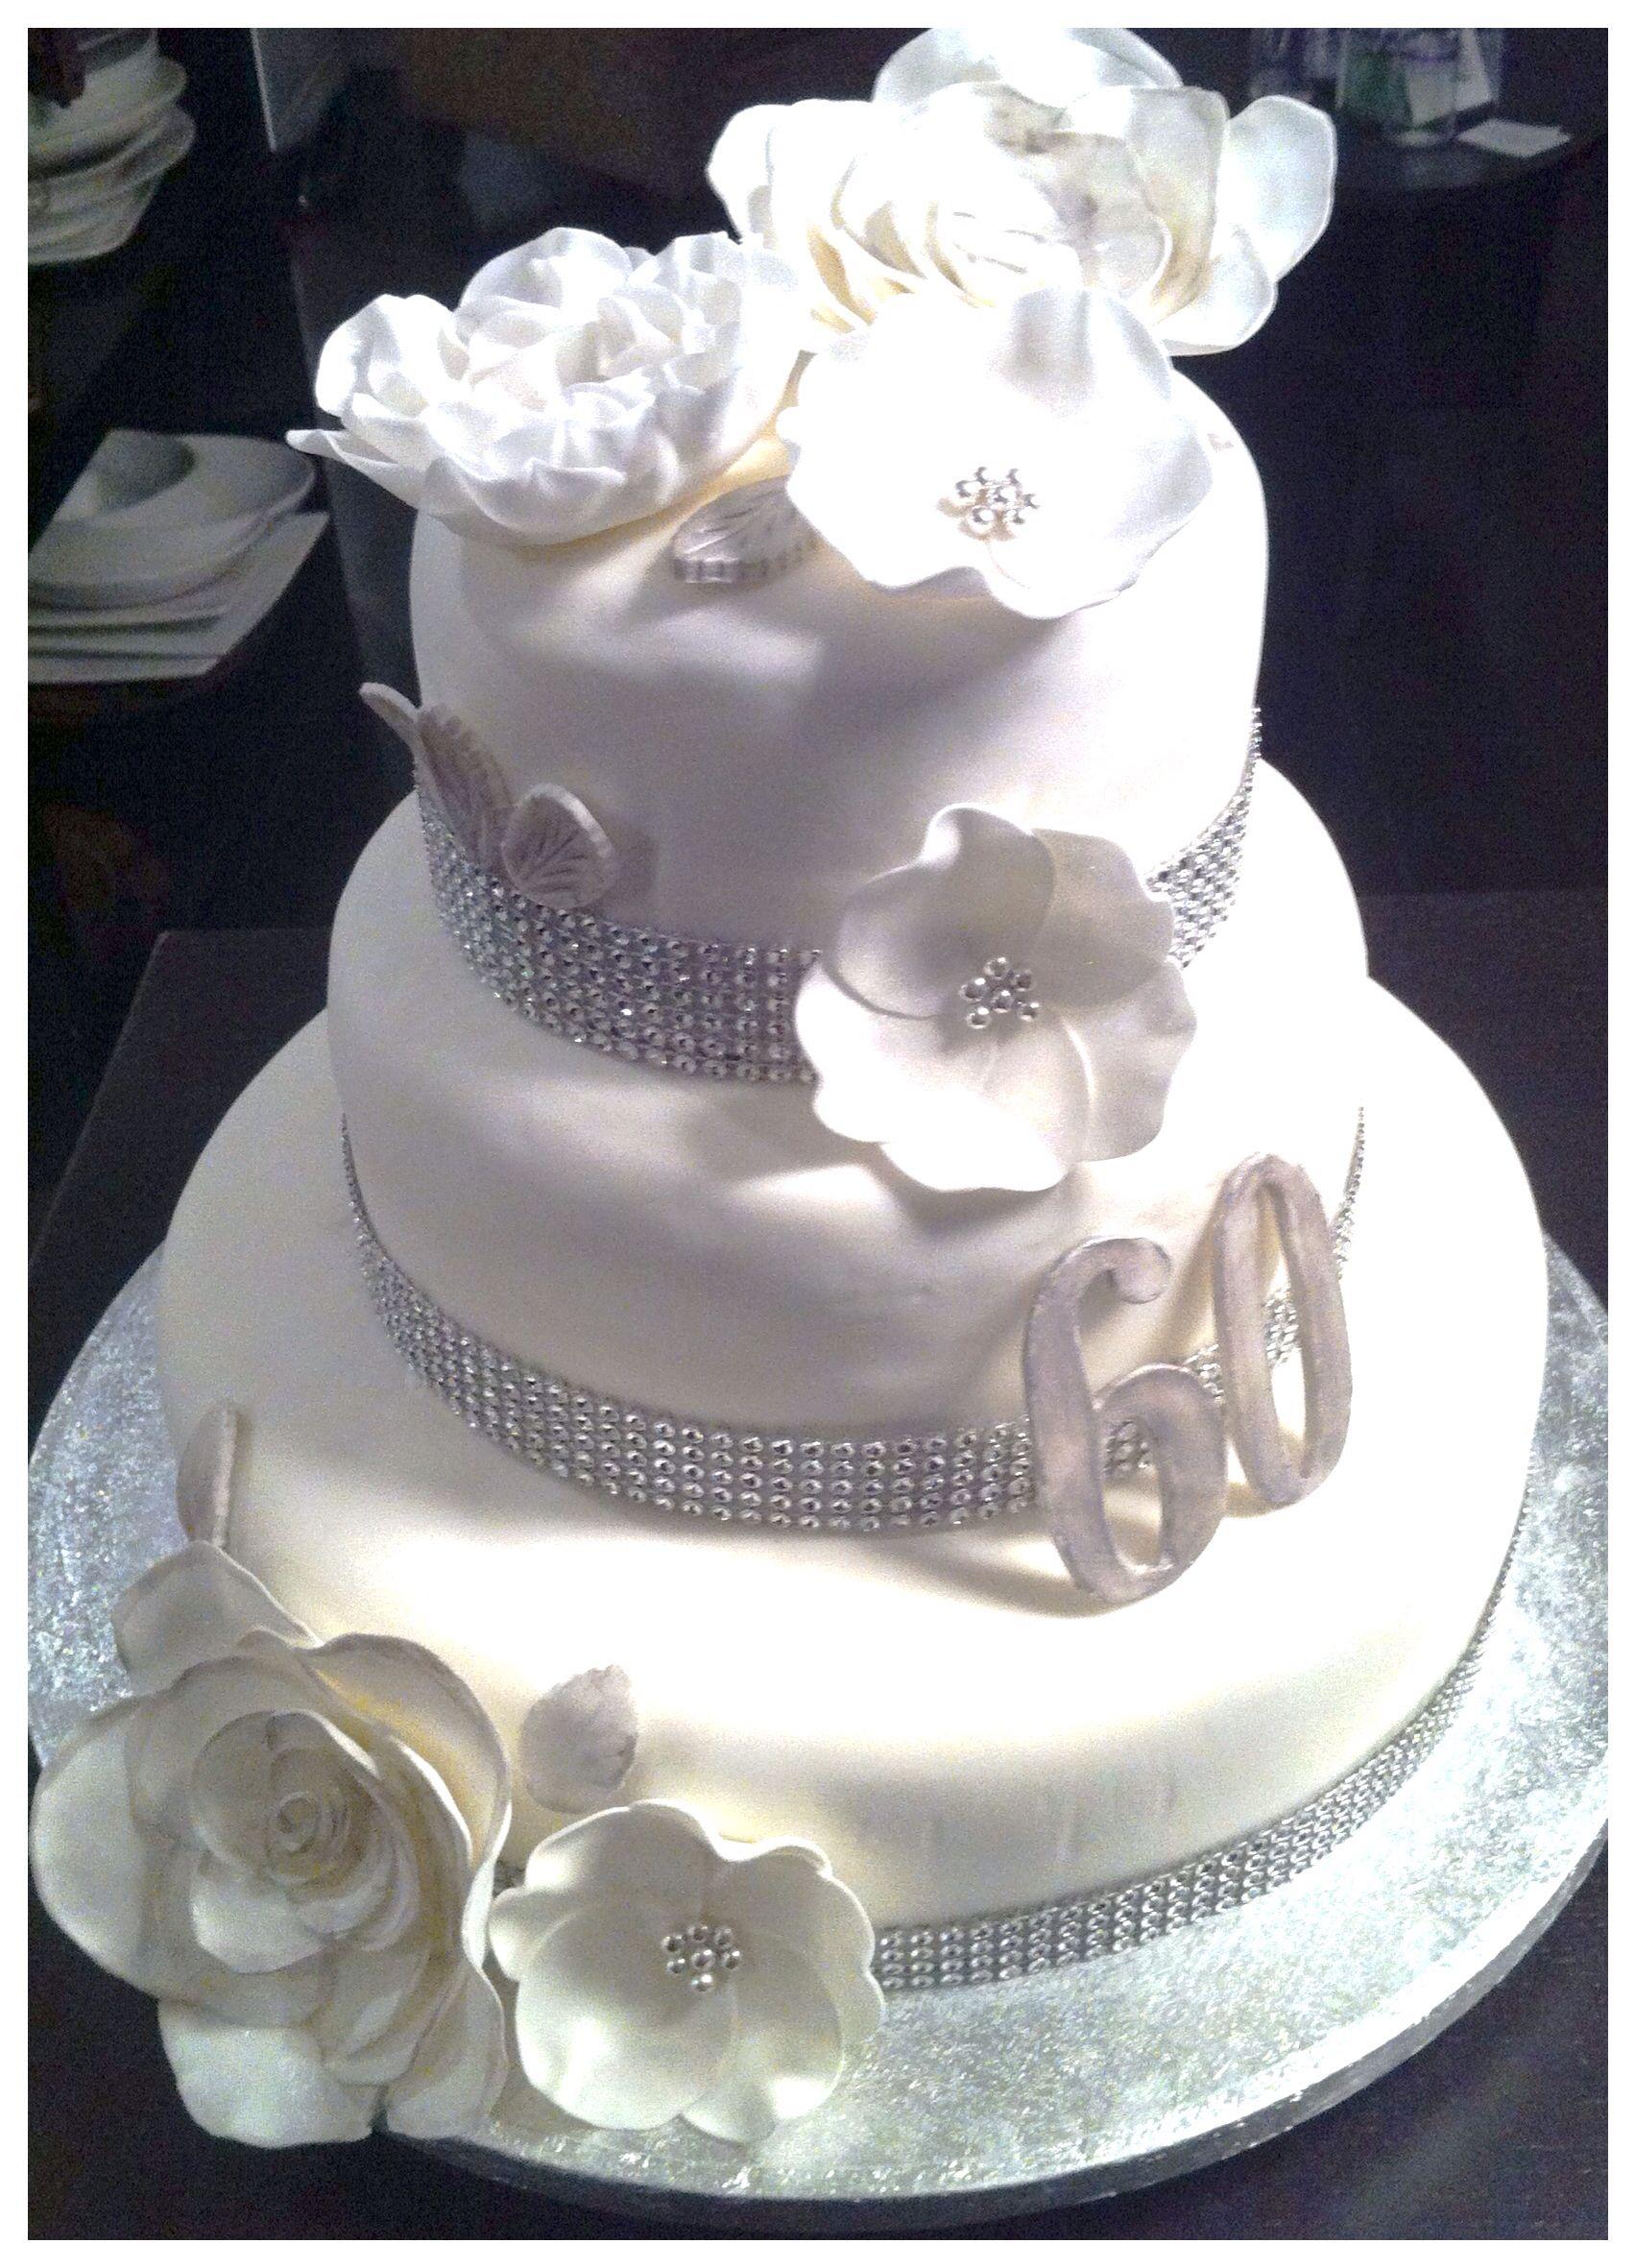 Th wedding anniversary cake ideas pinterest